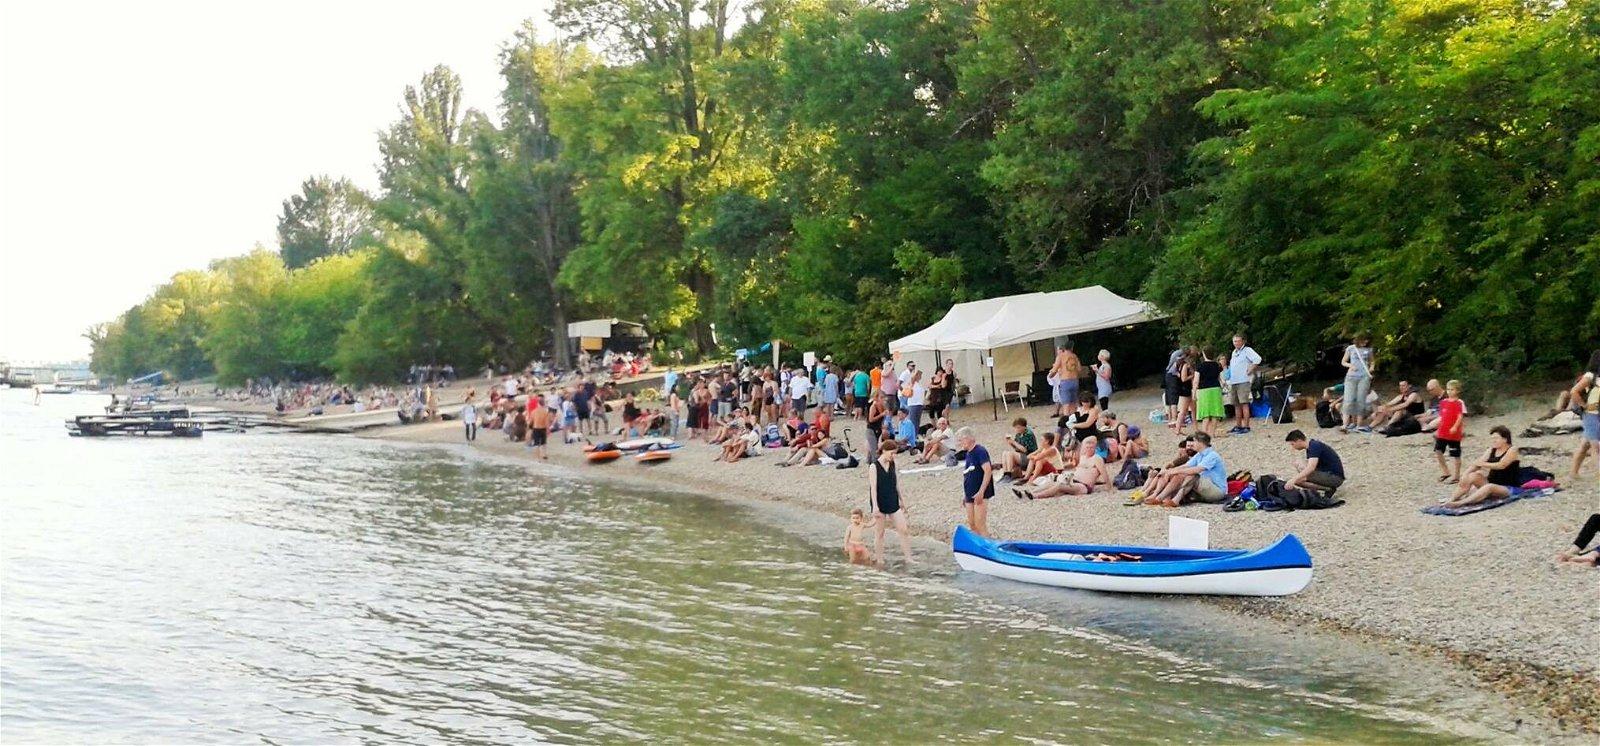 Nagy sikere lett a 40 év után nyitott dunai strandnak Budapesten